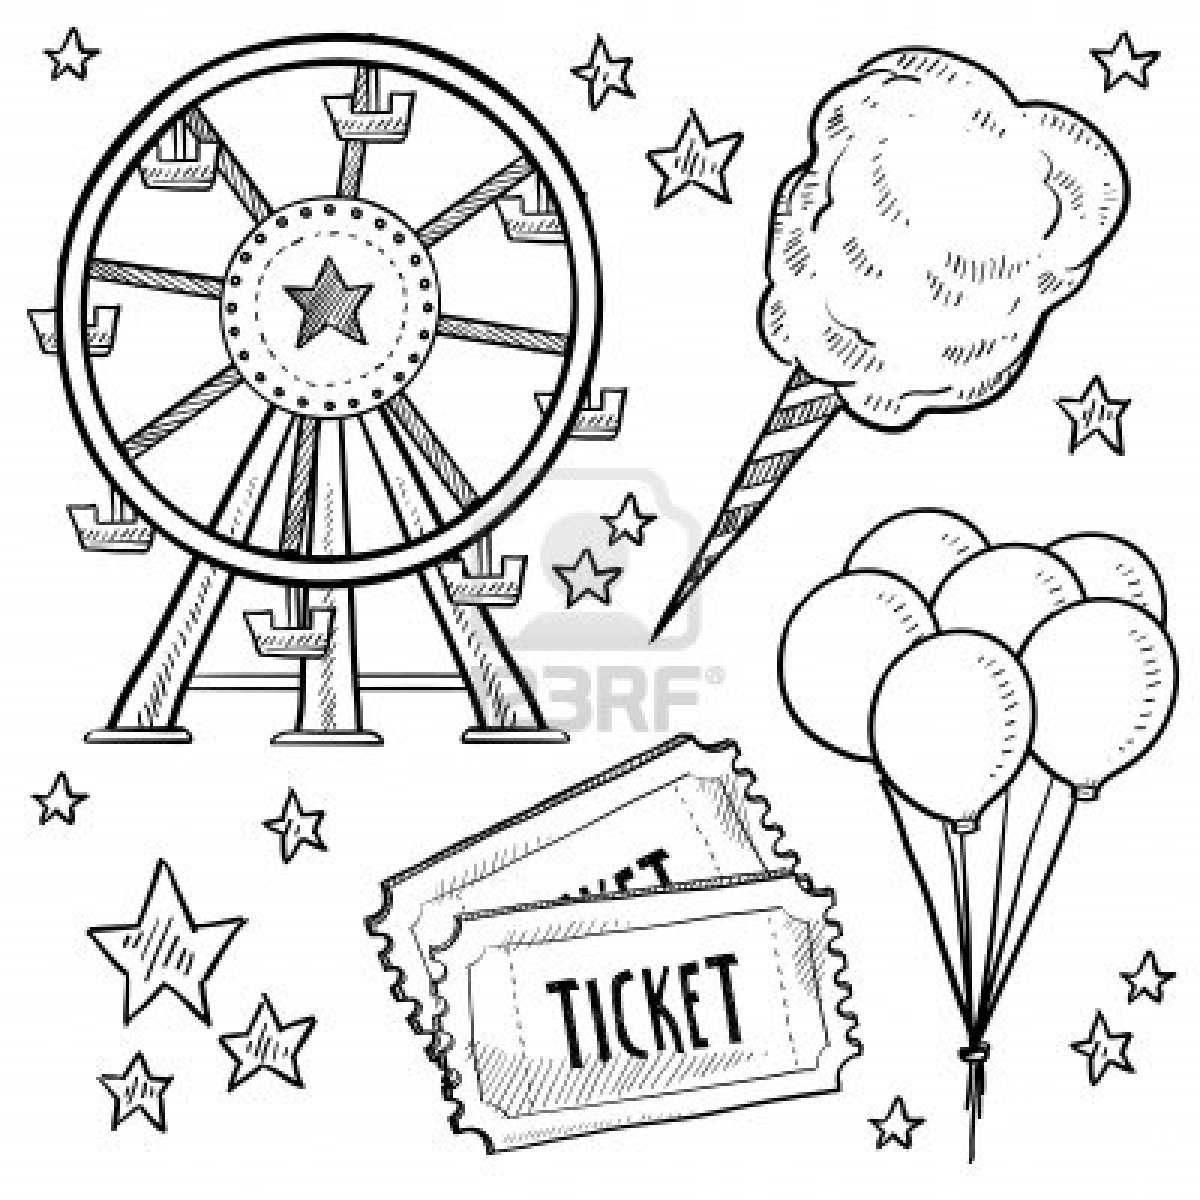 Ferris Wheel clipart vintage carnival Art also fun clip work